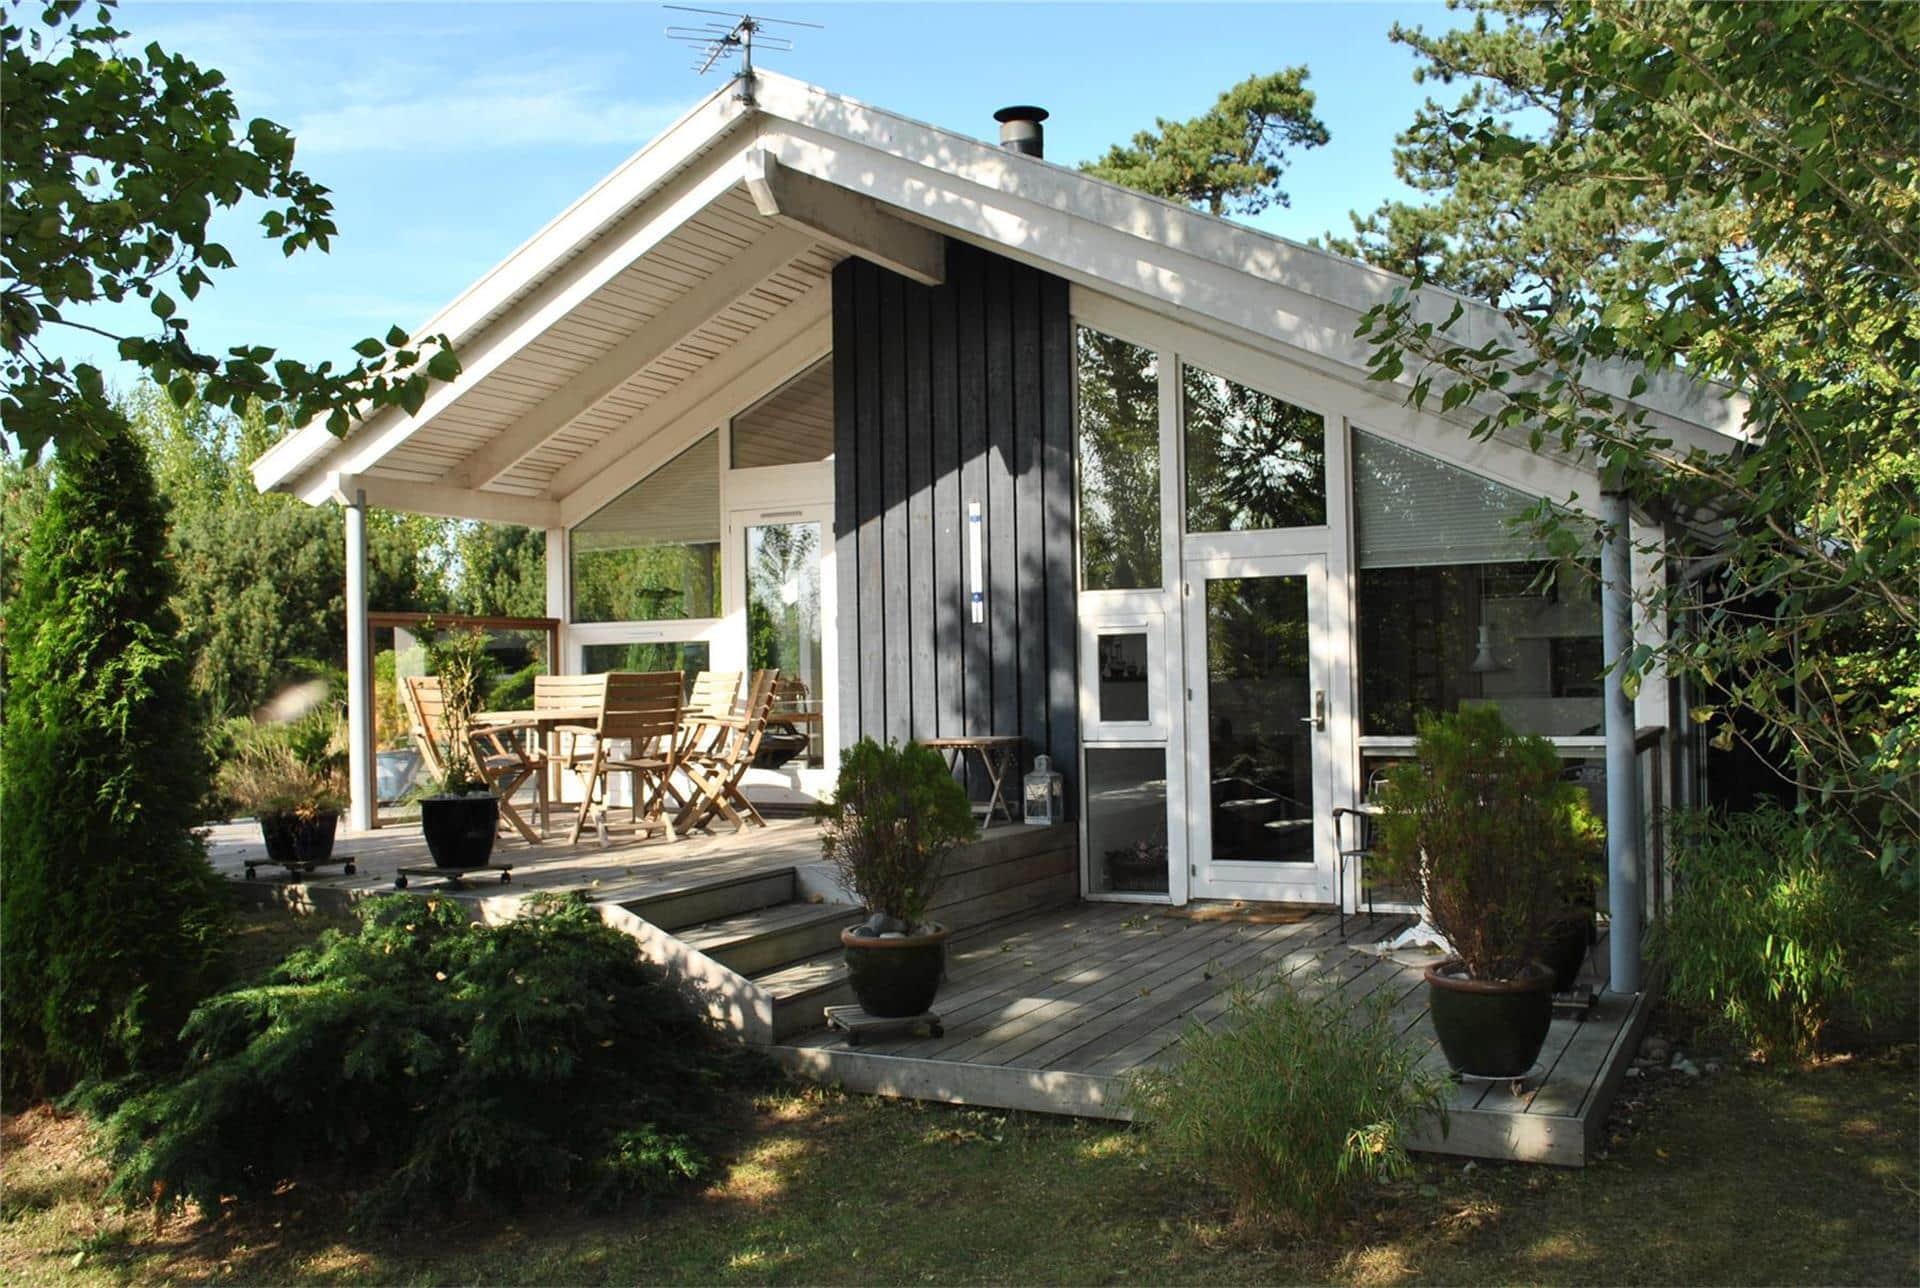 Bild 1-170 Ferienhaus 20205, Anemonevej 5, DK - 8305 Samsø